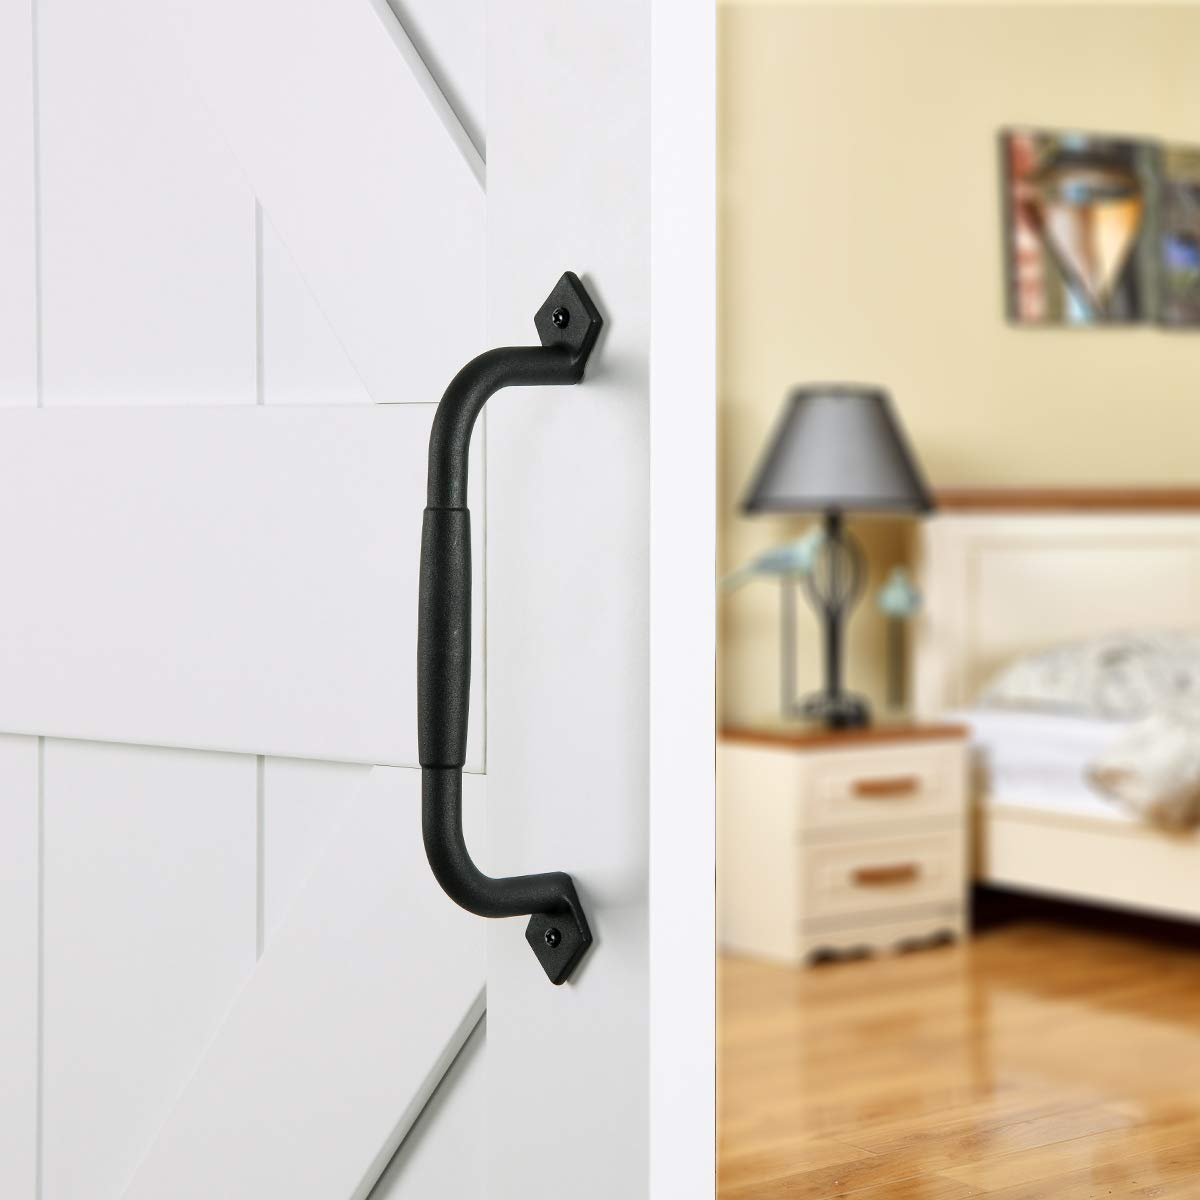 SMARTSTANDARD 10 inch Black Barn Door Pull Handle for Gate Kitchen Furniture Cabinet Closet Drawer